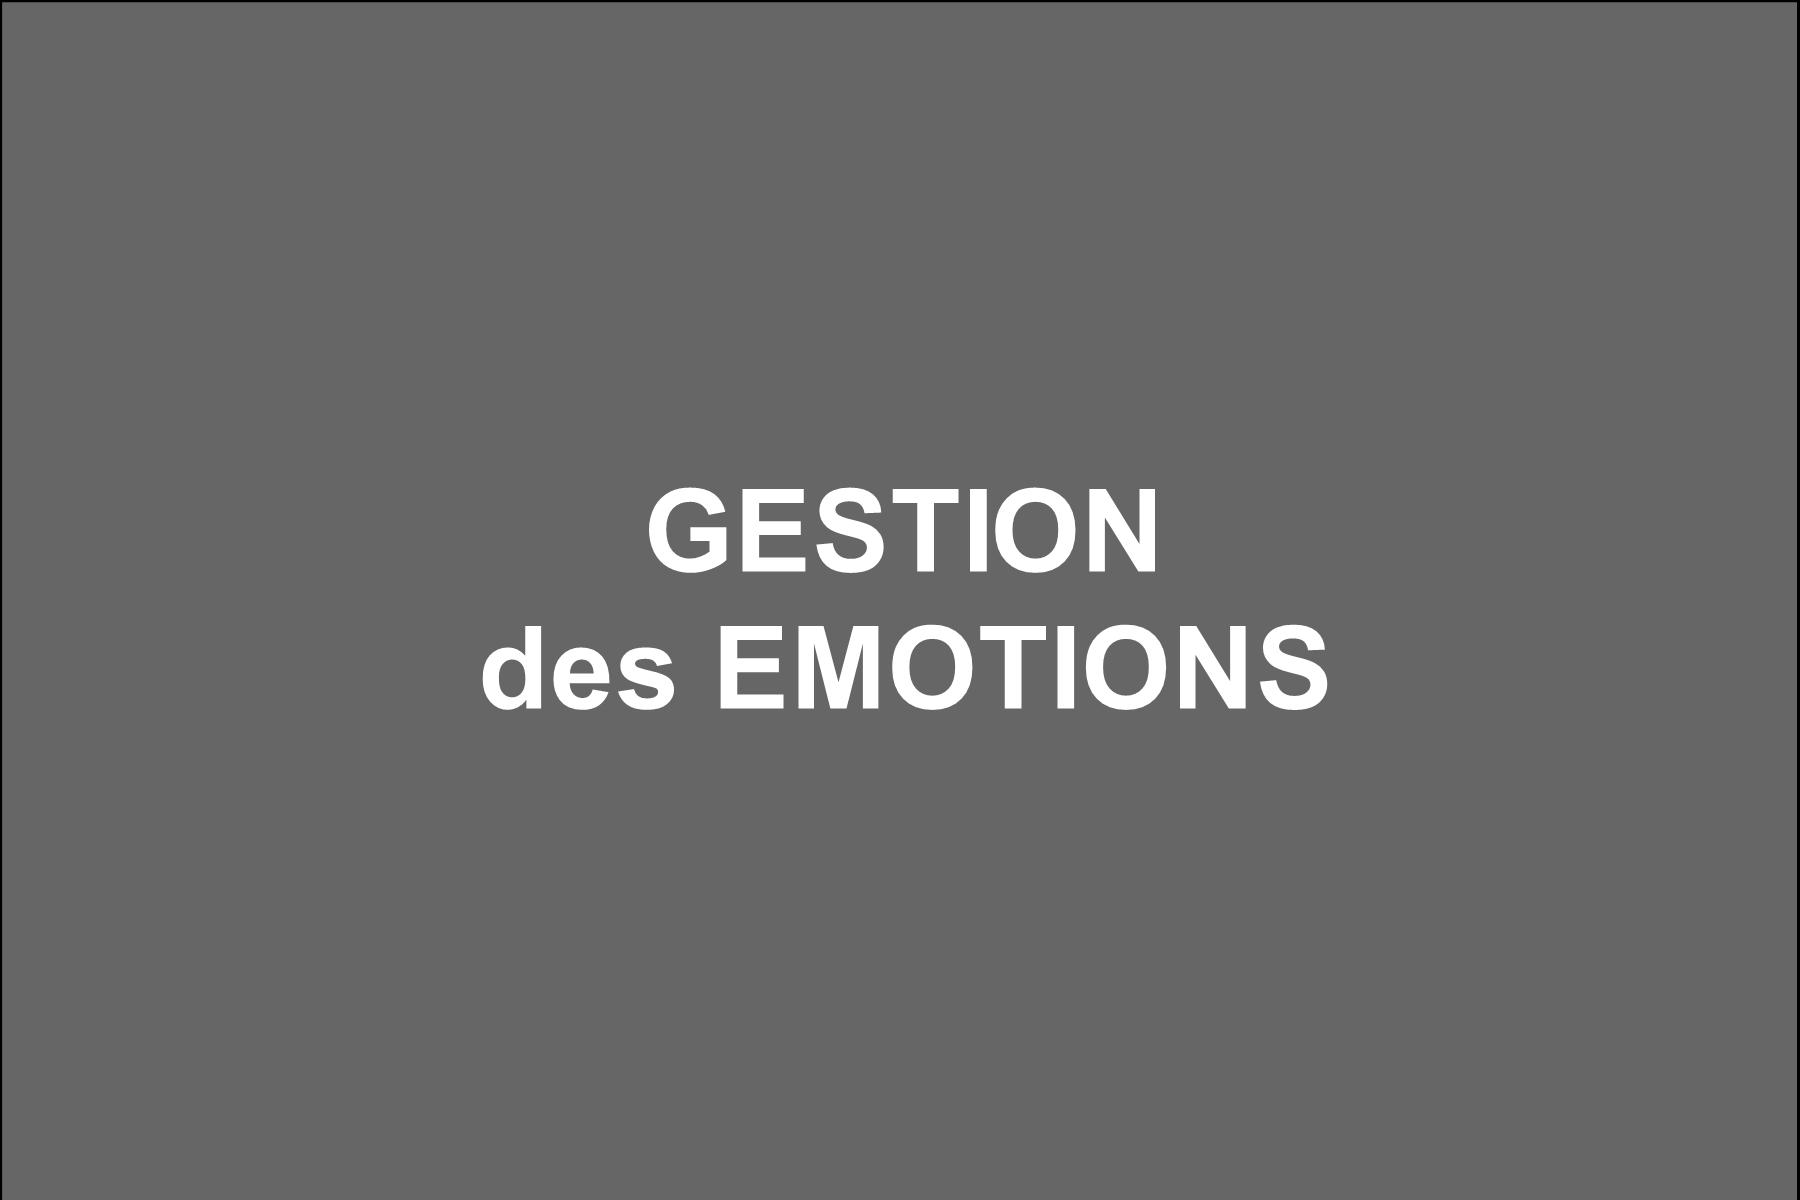 GESTION DES EMOTIONS